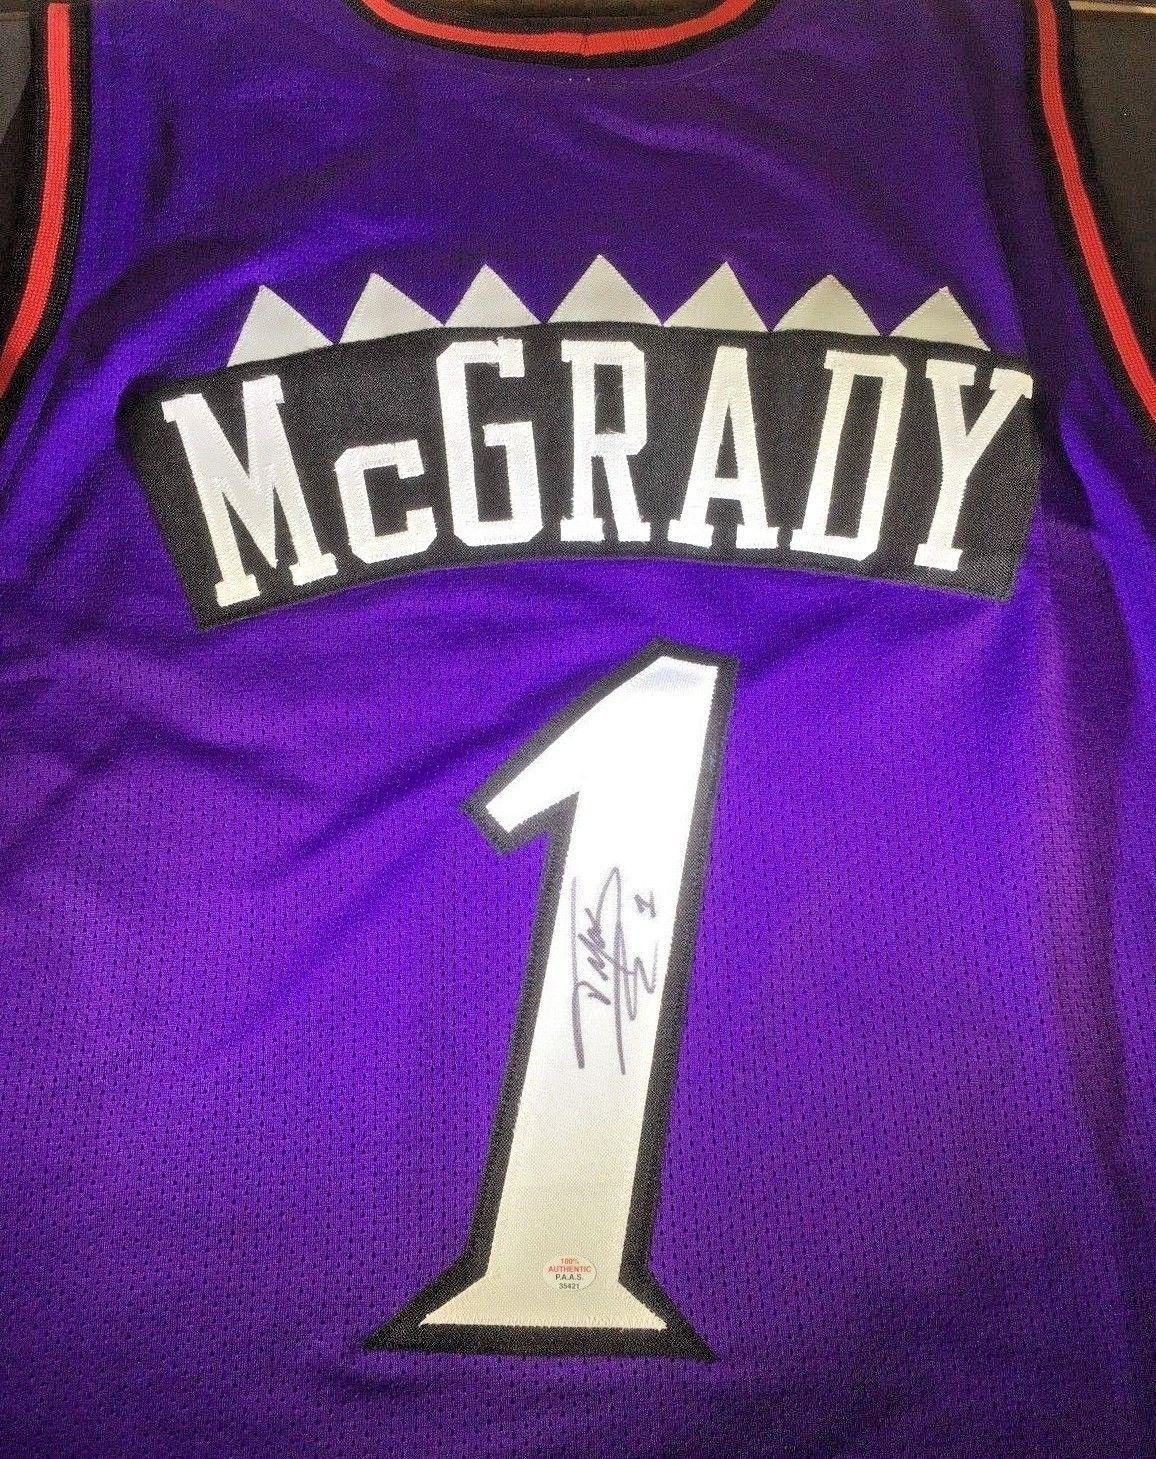 the best attitude 13d02 3d791 TRACY MCGRADY - NBA HALL OF FAME - HAND SIGNED TORONTO RAPTORS CUSTOM  JERSEY COA